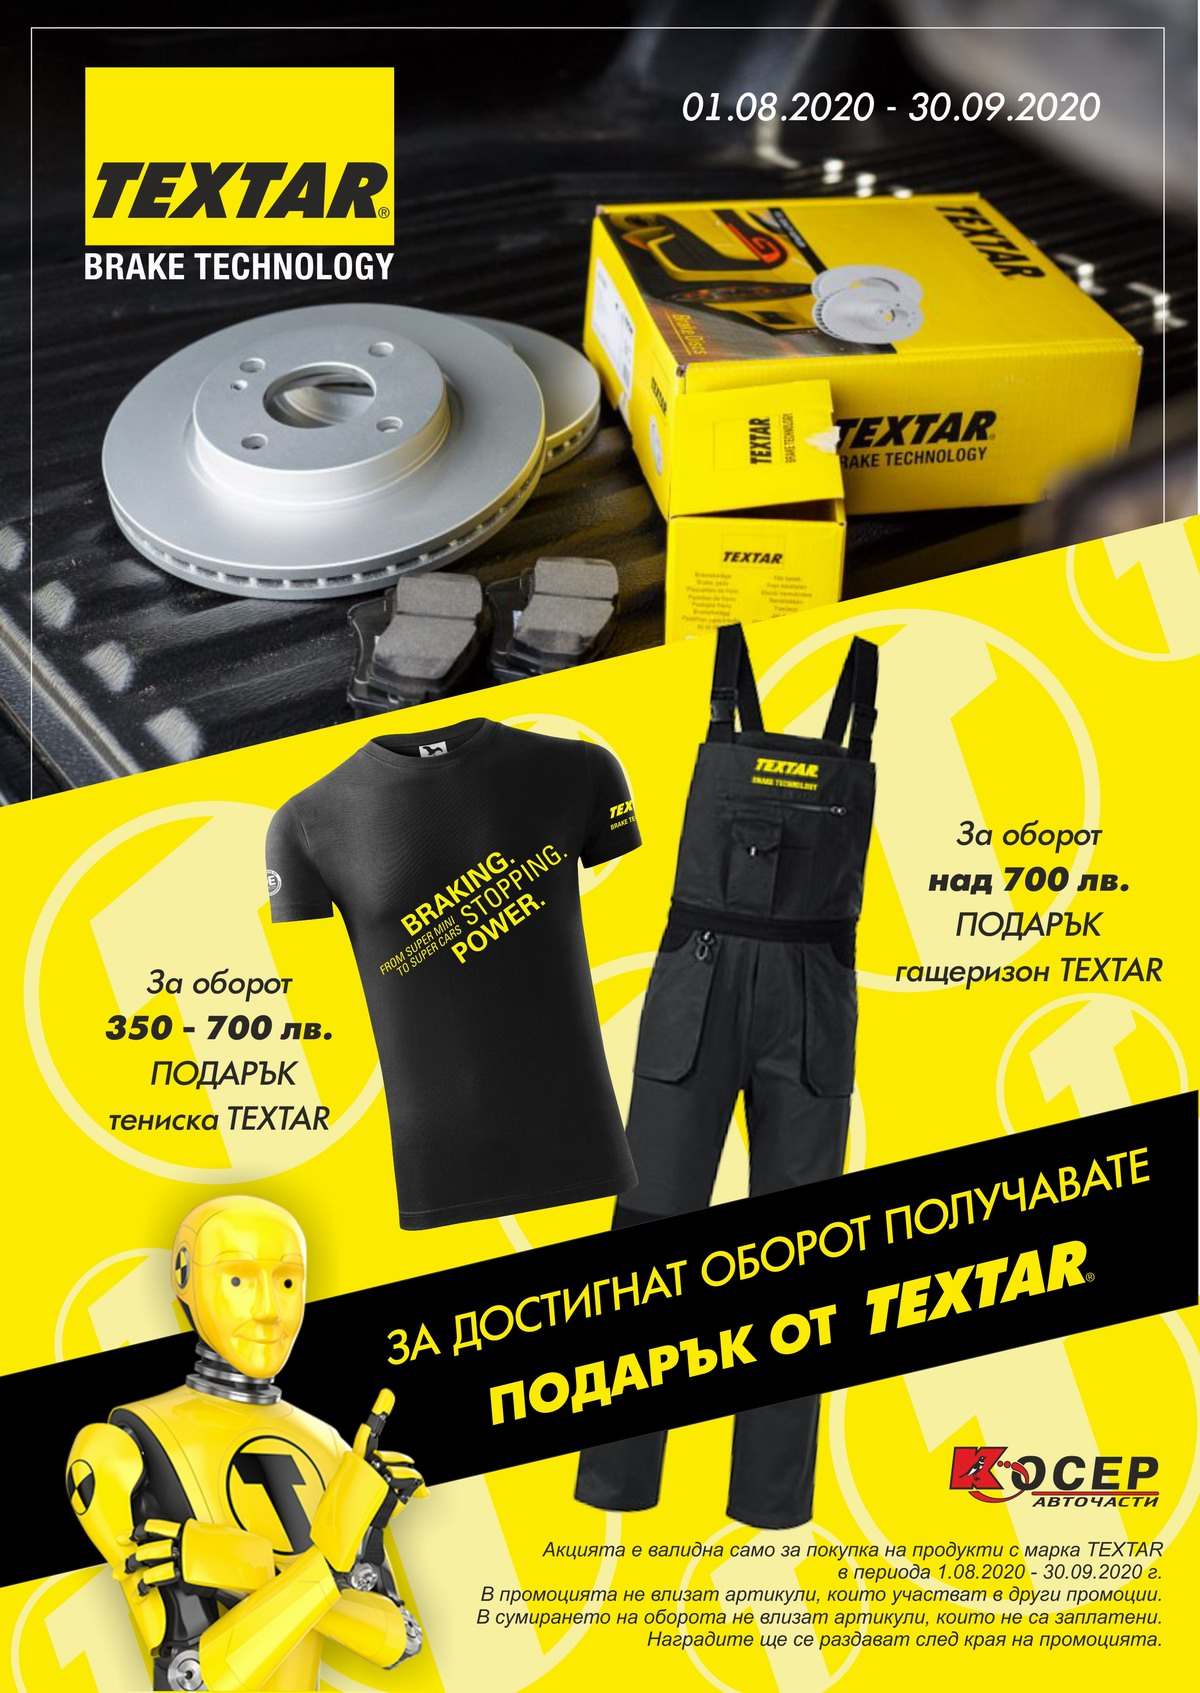 Промоция TEXTAR, 01.08.2020 - 30.09.2020